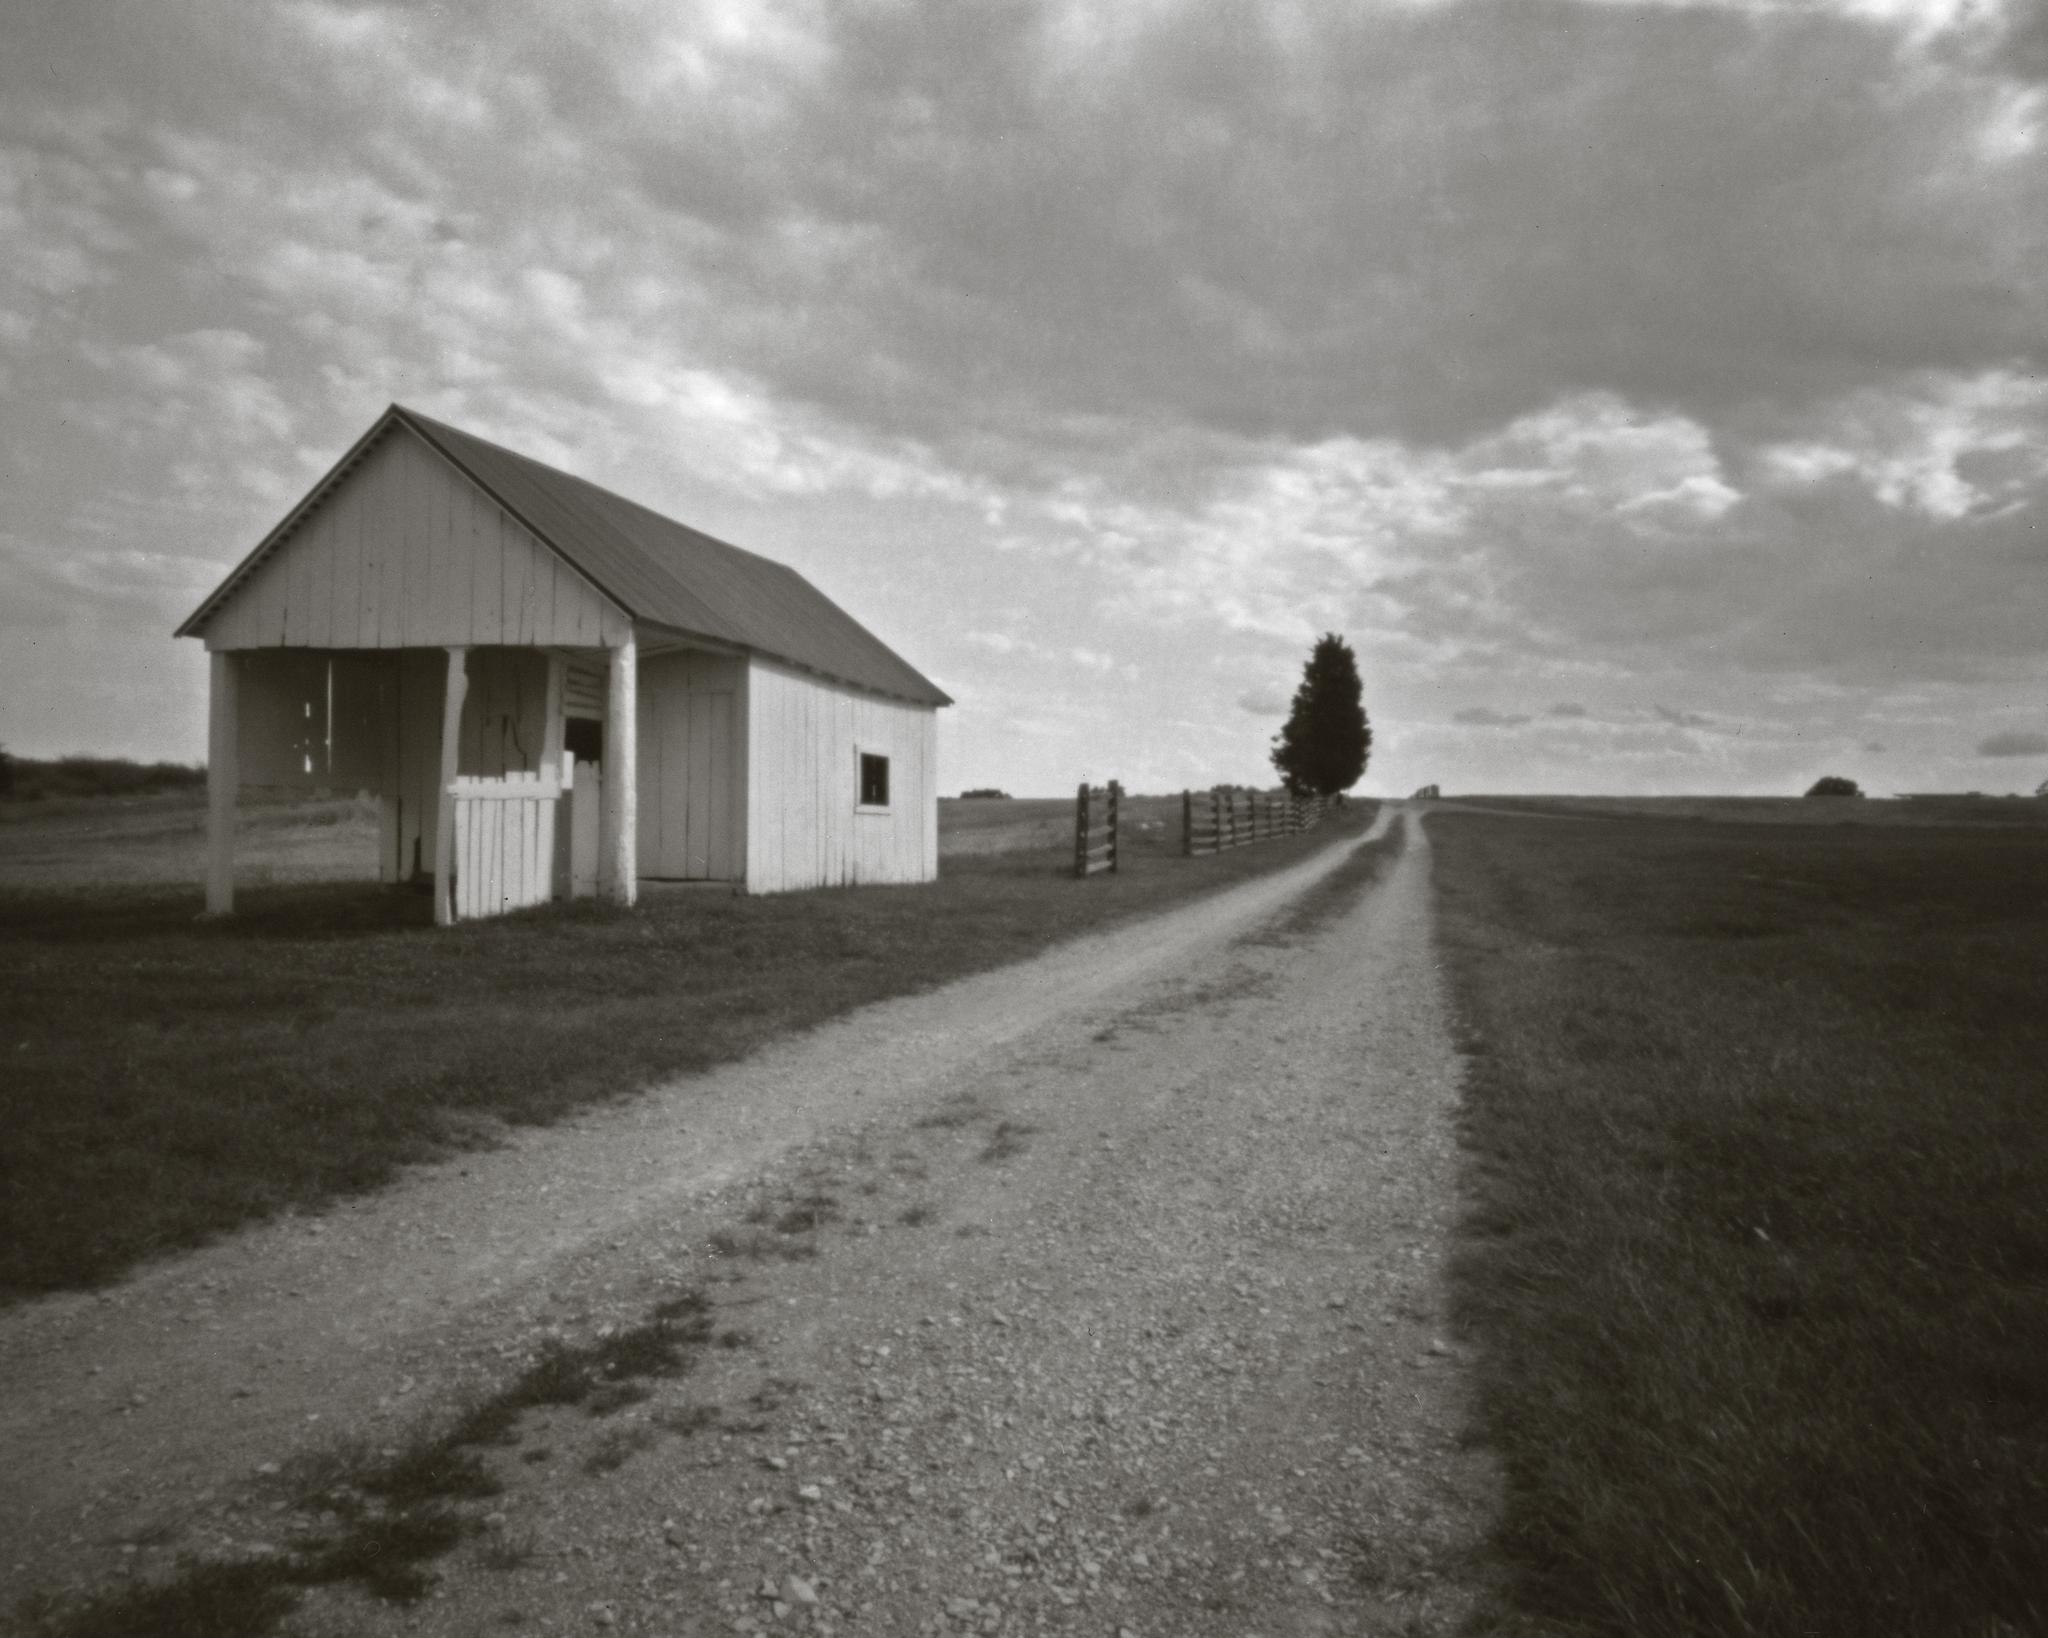 Mumma Farm. Antietam National Battlefield. Sharpsburg, Maryland. Zero Image 75mm 4x5.